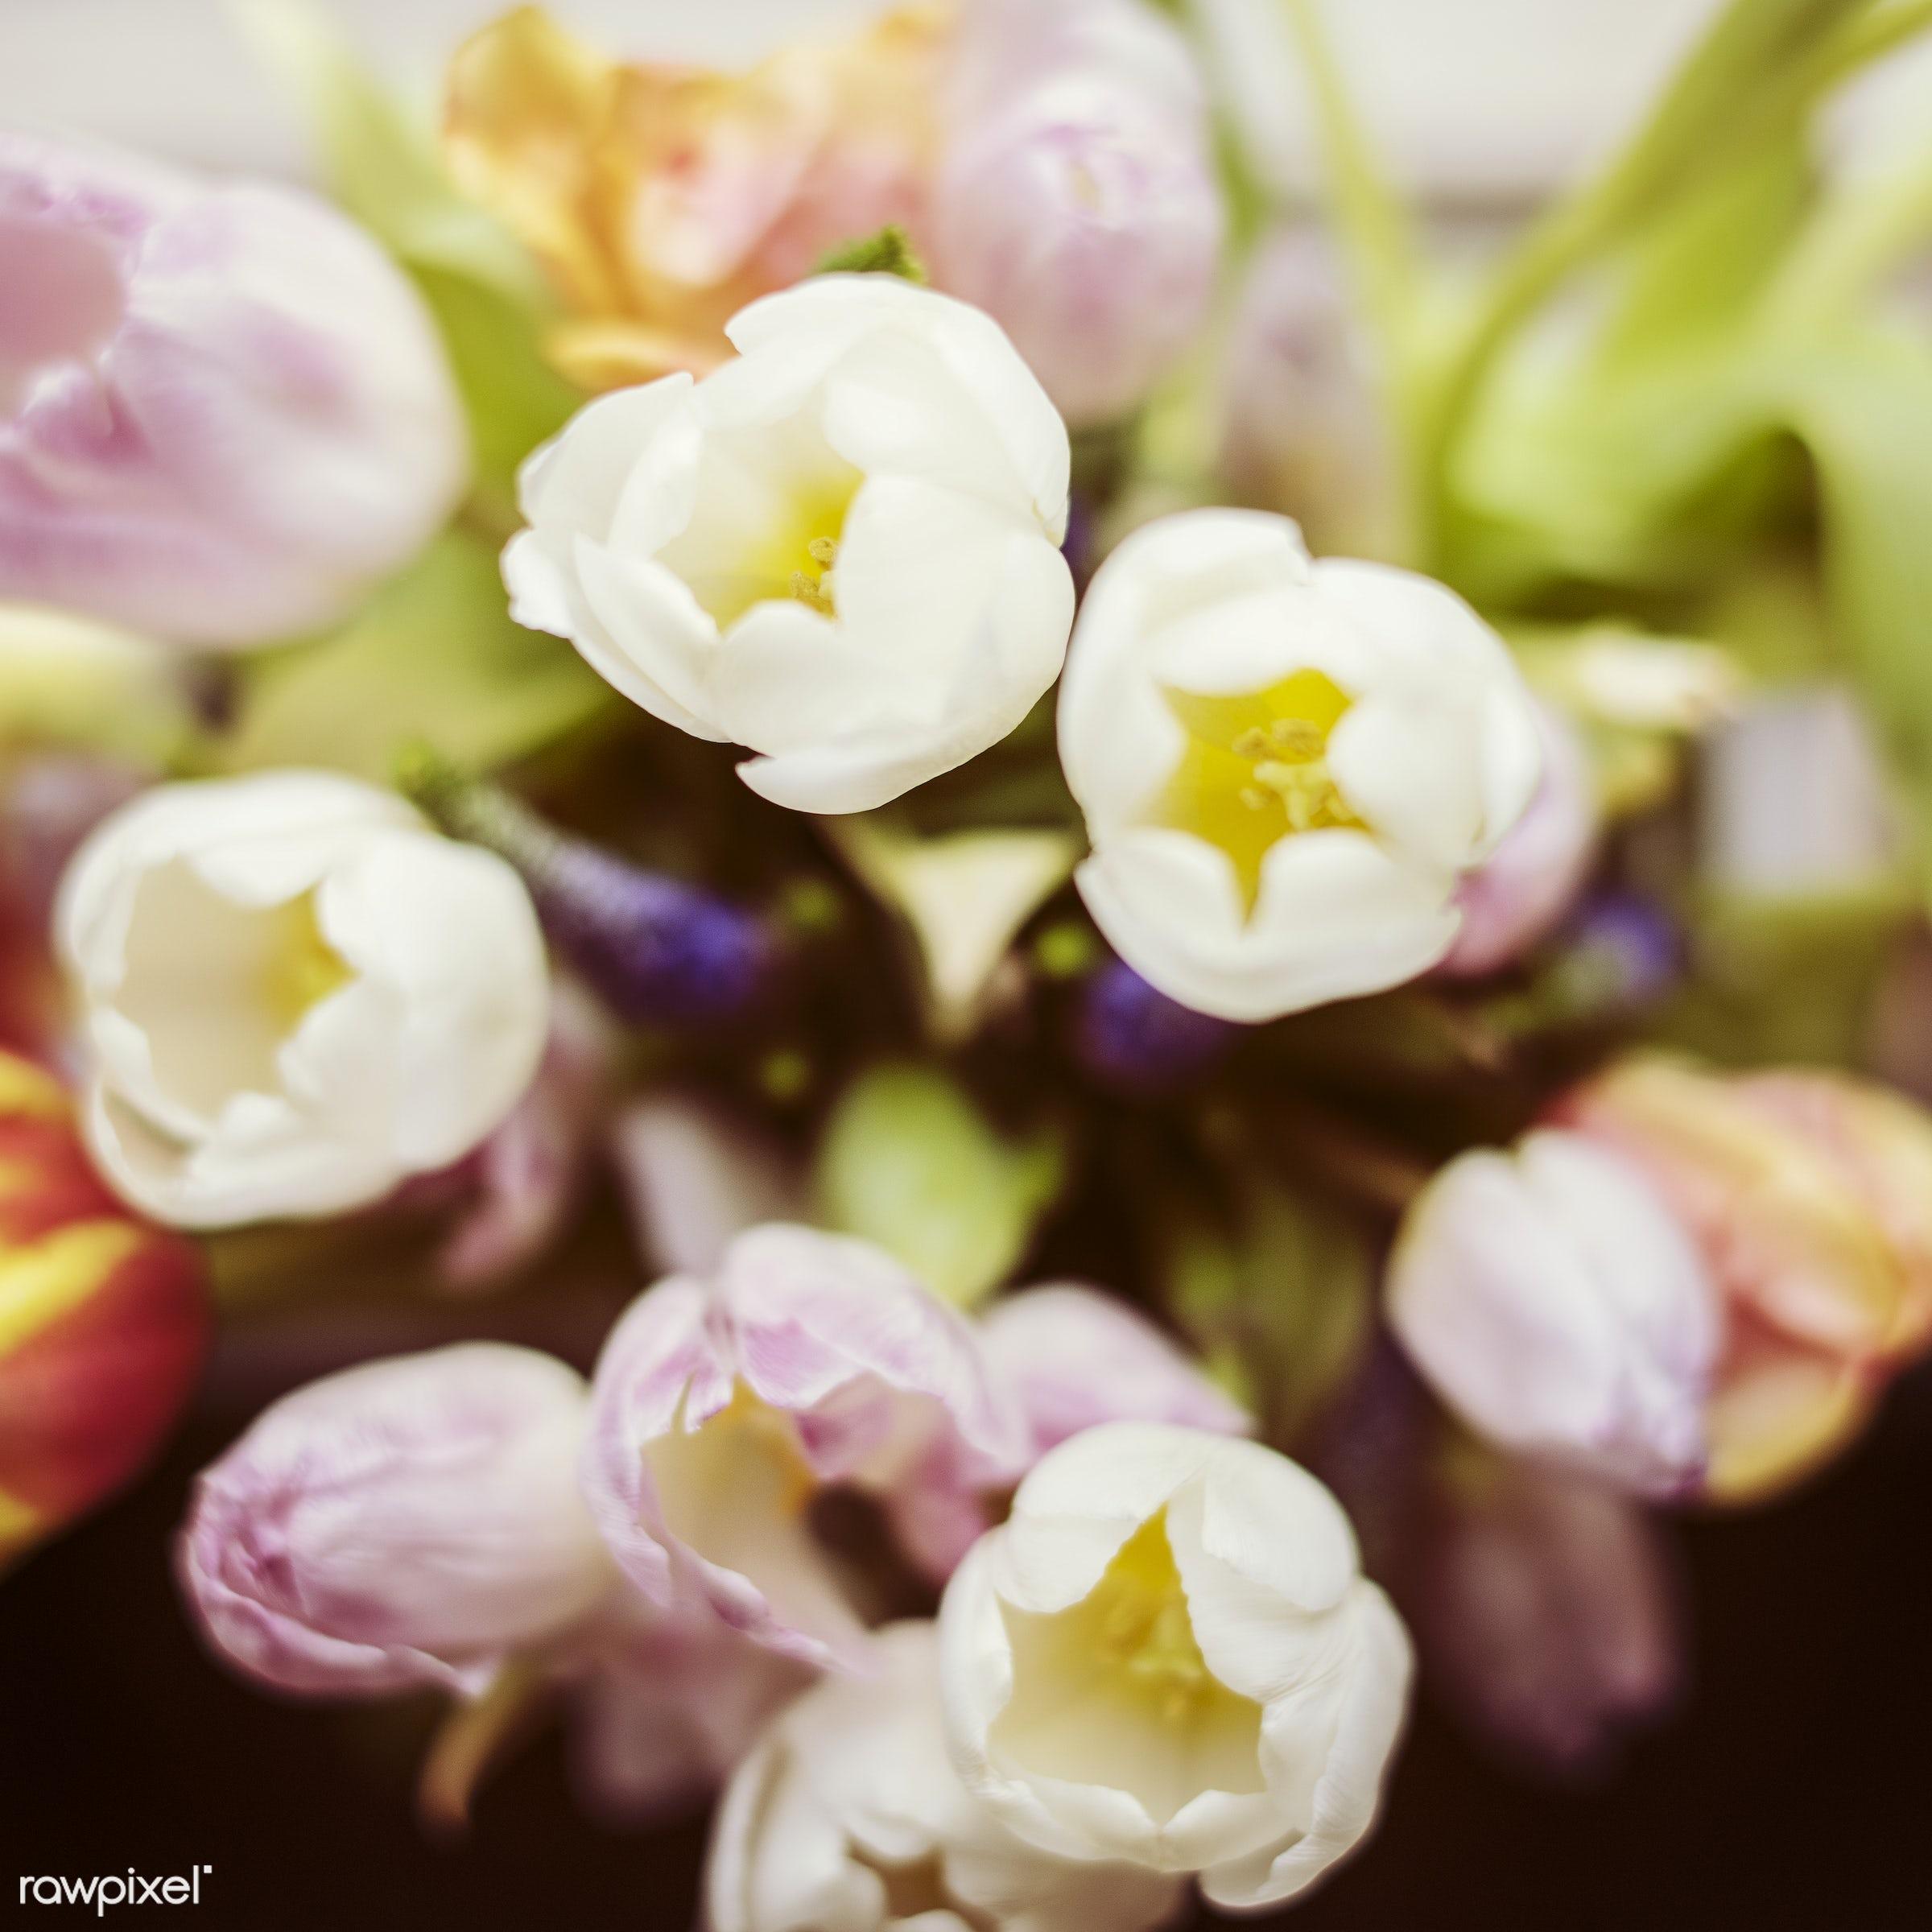 festive, nobody, detail, decorative, colorful, events, plants, tulips, spring, blossom, decor, nature, fresh, attractive,...